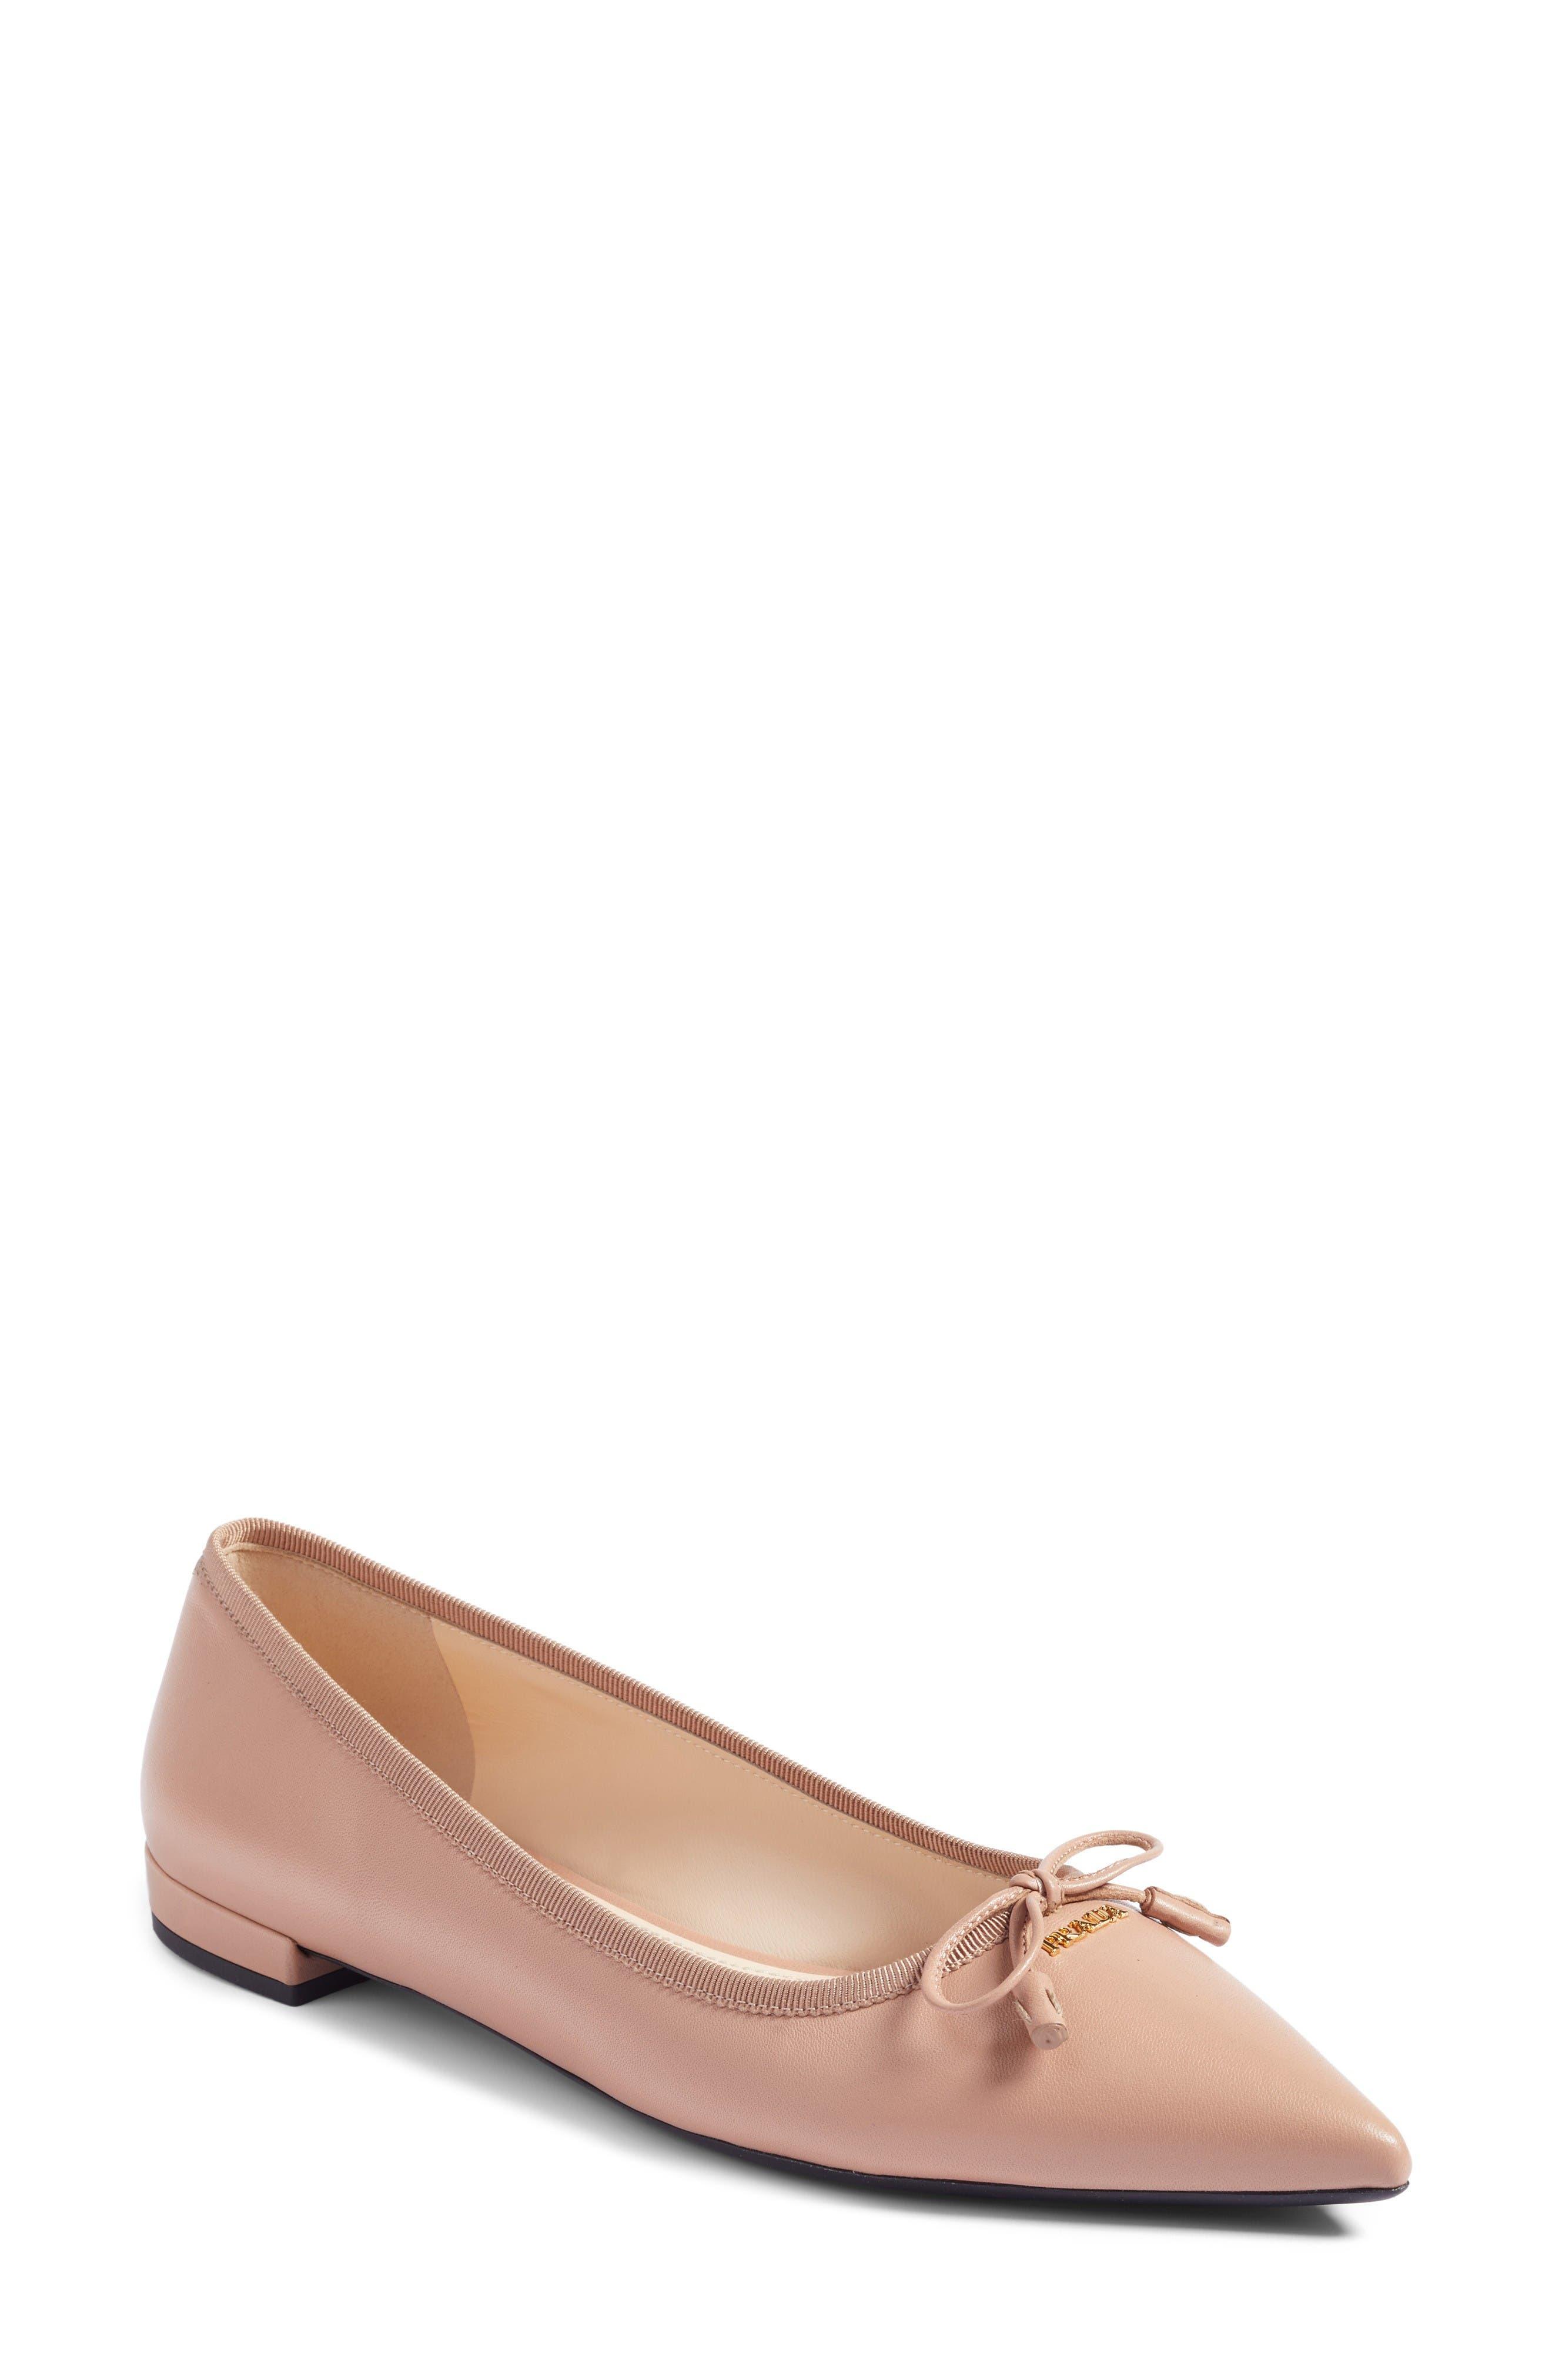 868760f328 Women s Prada Shoes